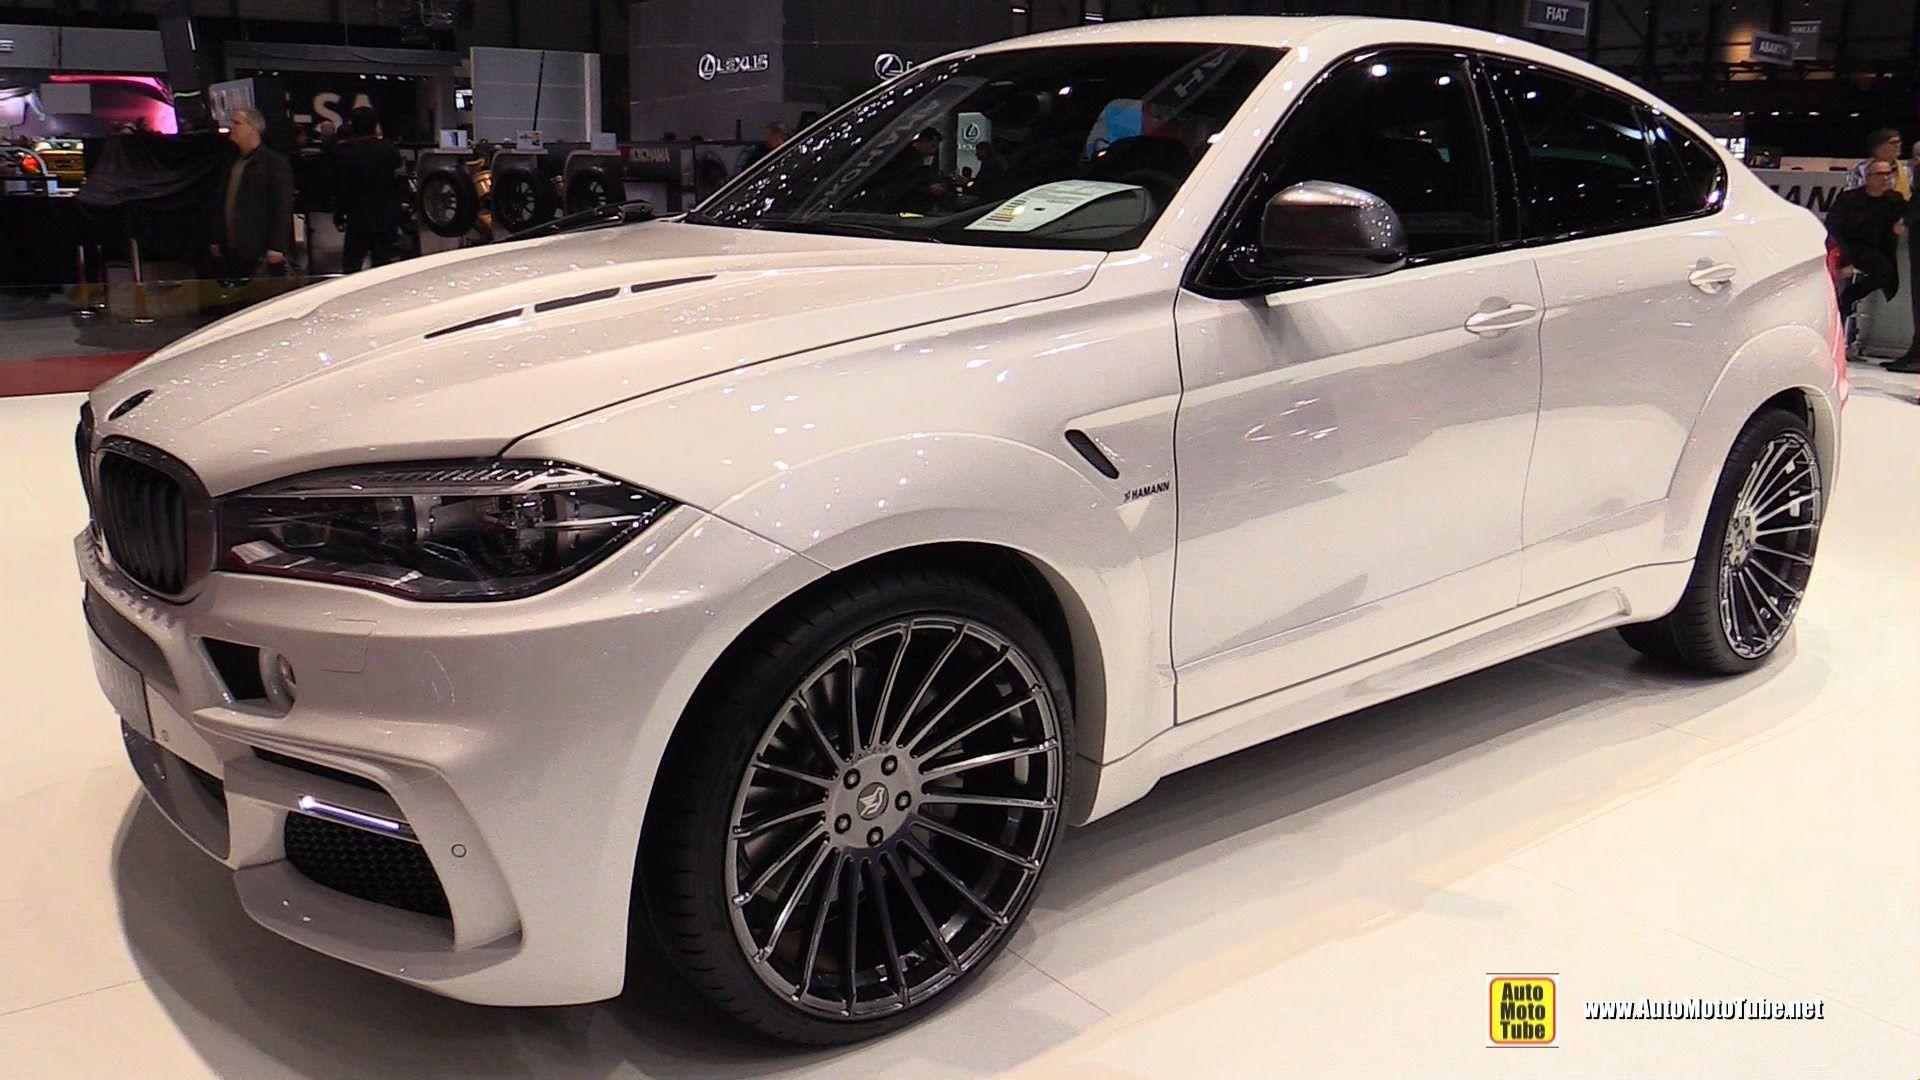 Custom White Bmw X6 M50d By Hamman Dream Cars Wish List